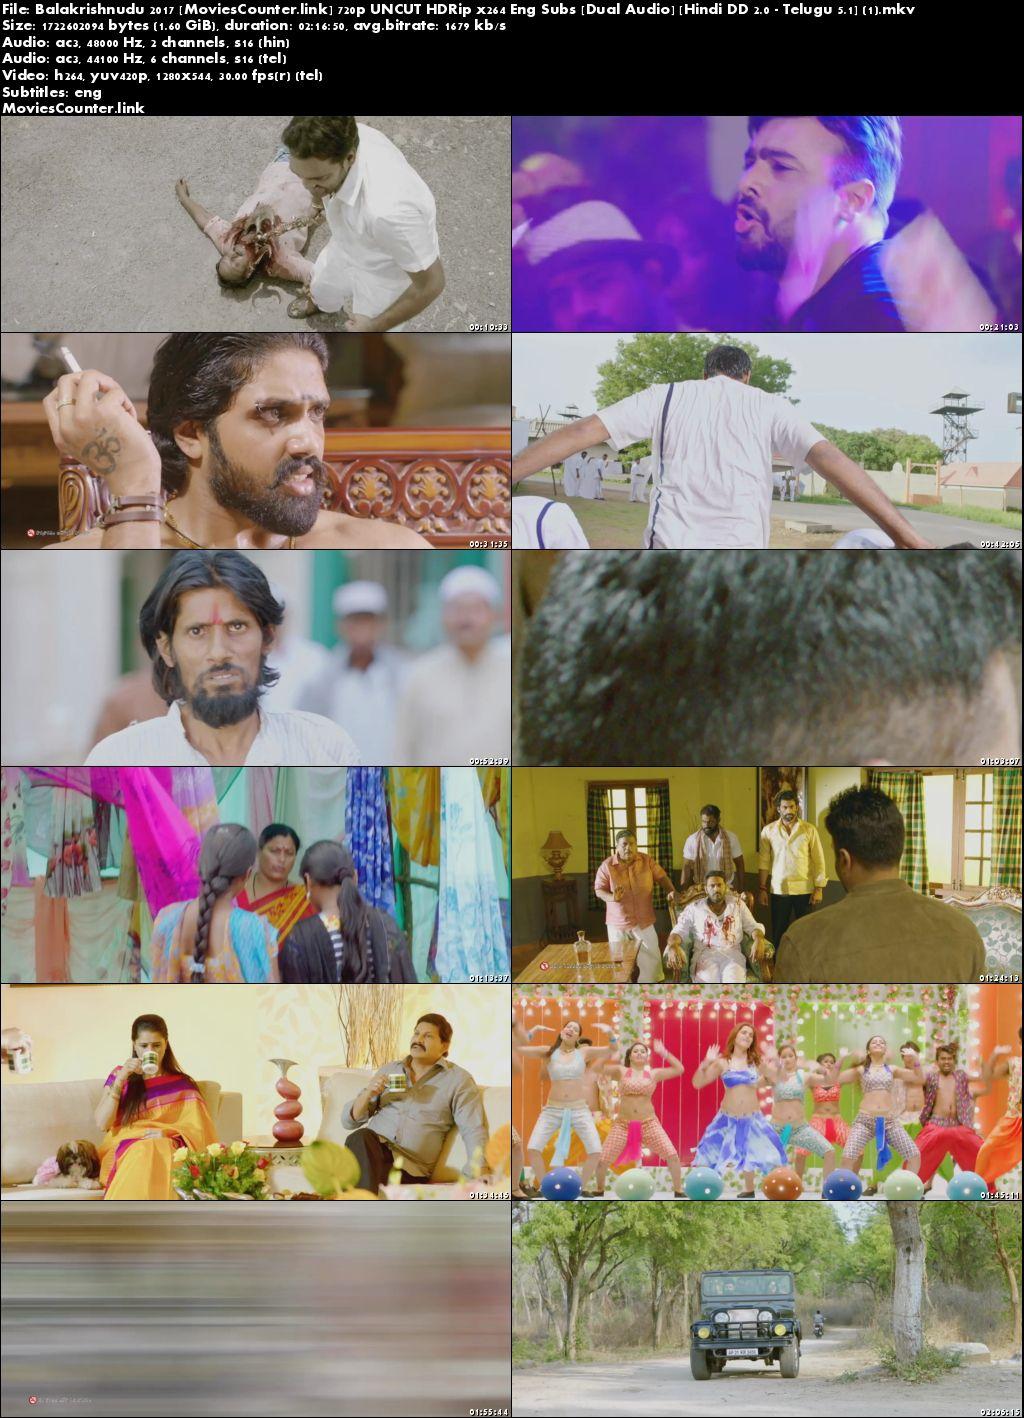 Screen Shots Balakrishnudu 2017 Hindi Dubbed HD 720p